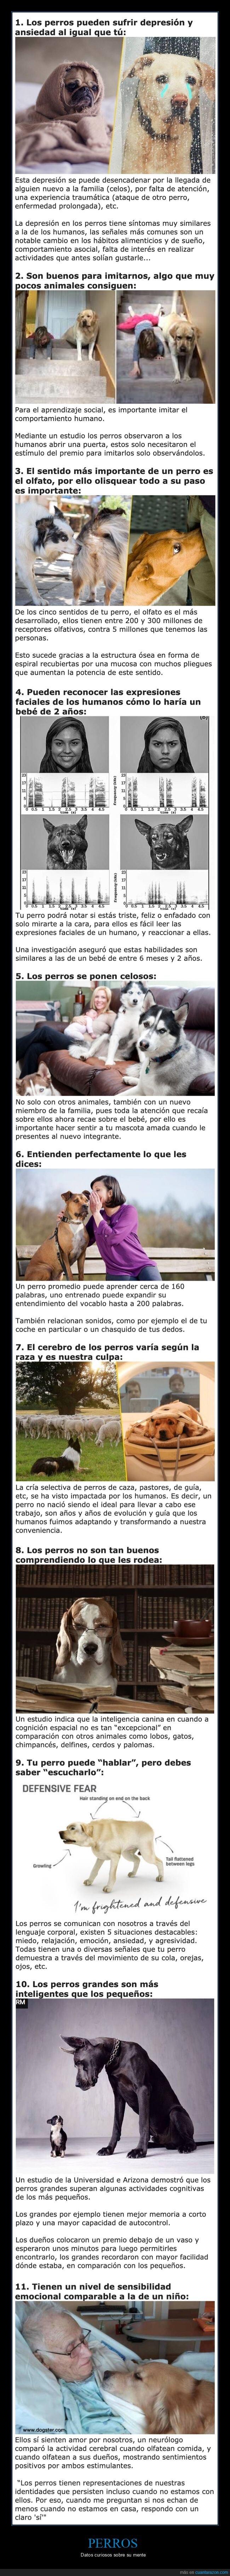 curiosidades,mente,perros